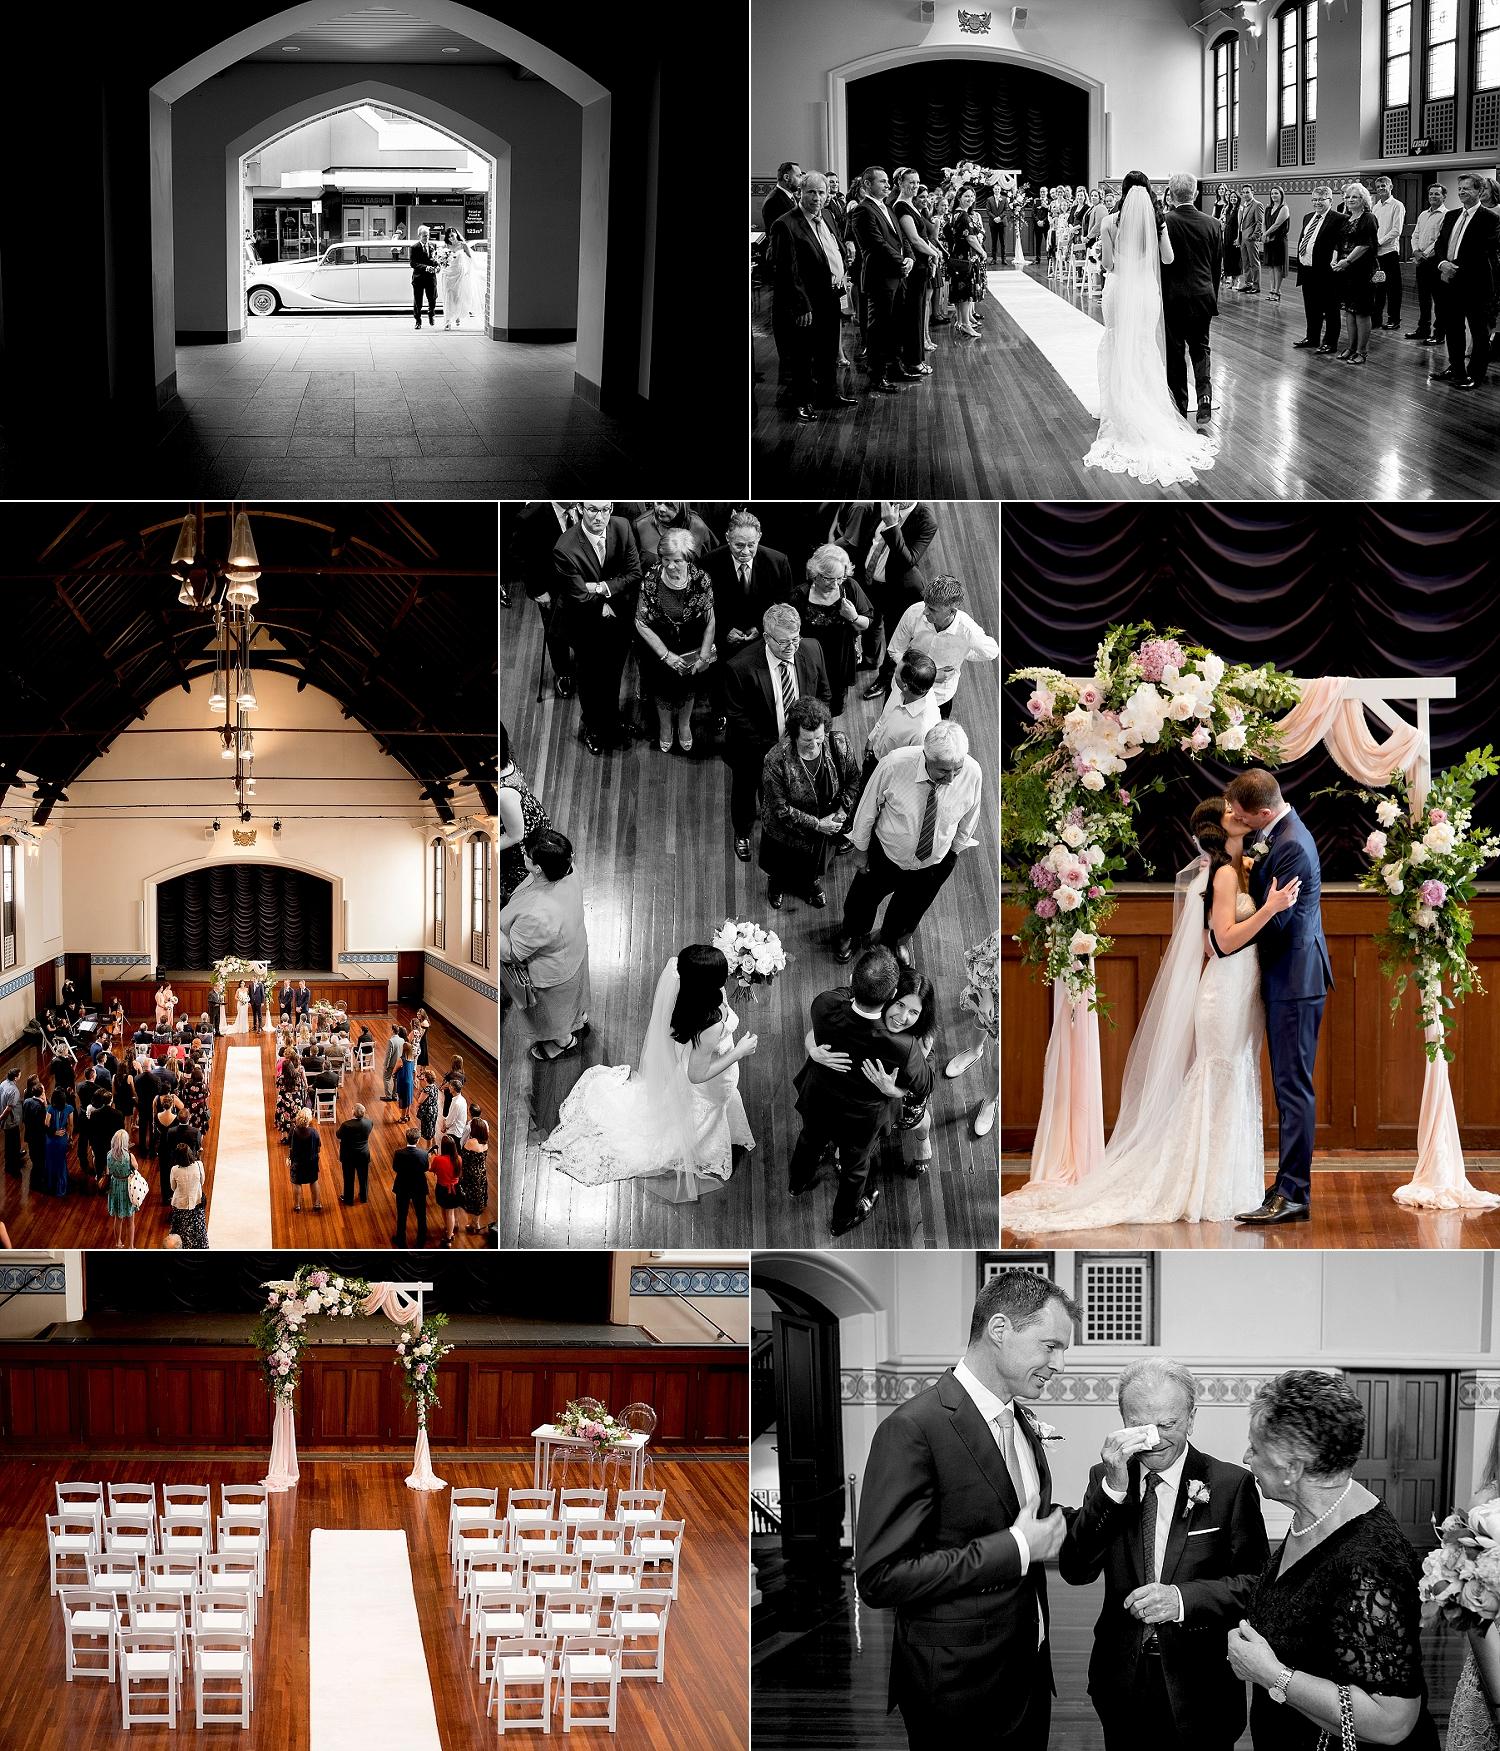 31_Perth Town Hall wedding.jpg